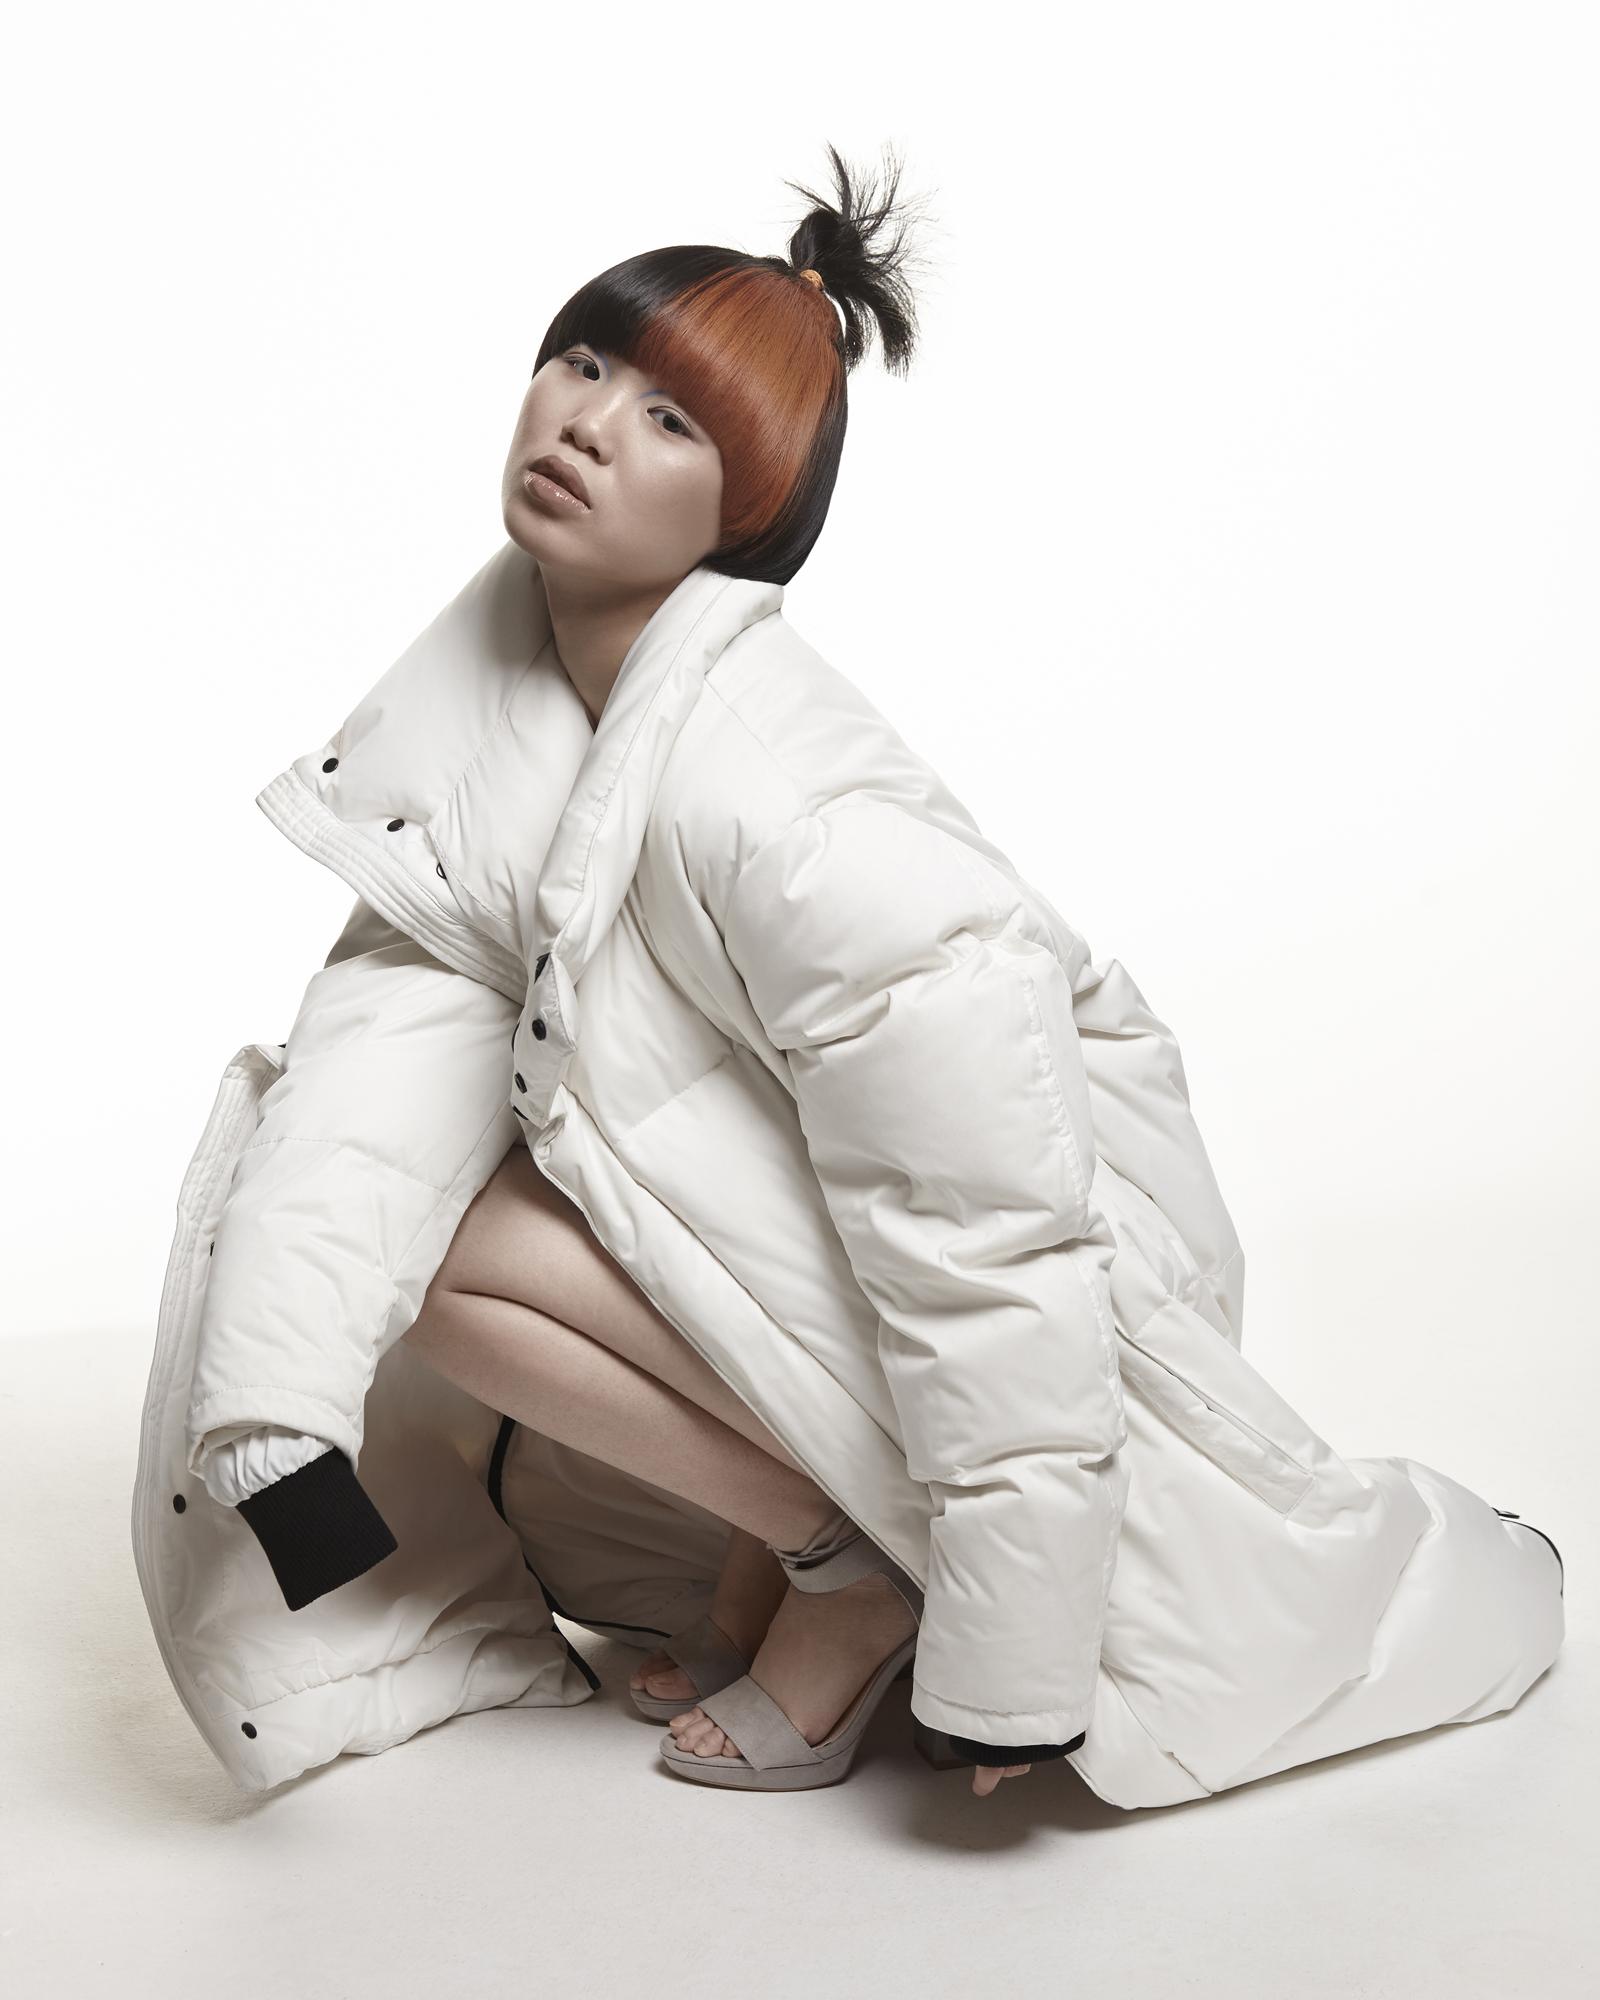 Editorial Korean Ginger tiff8.jpg